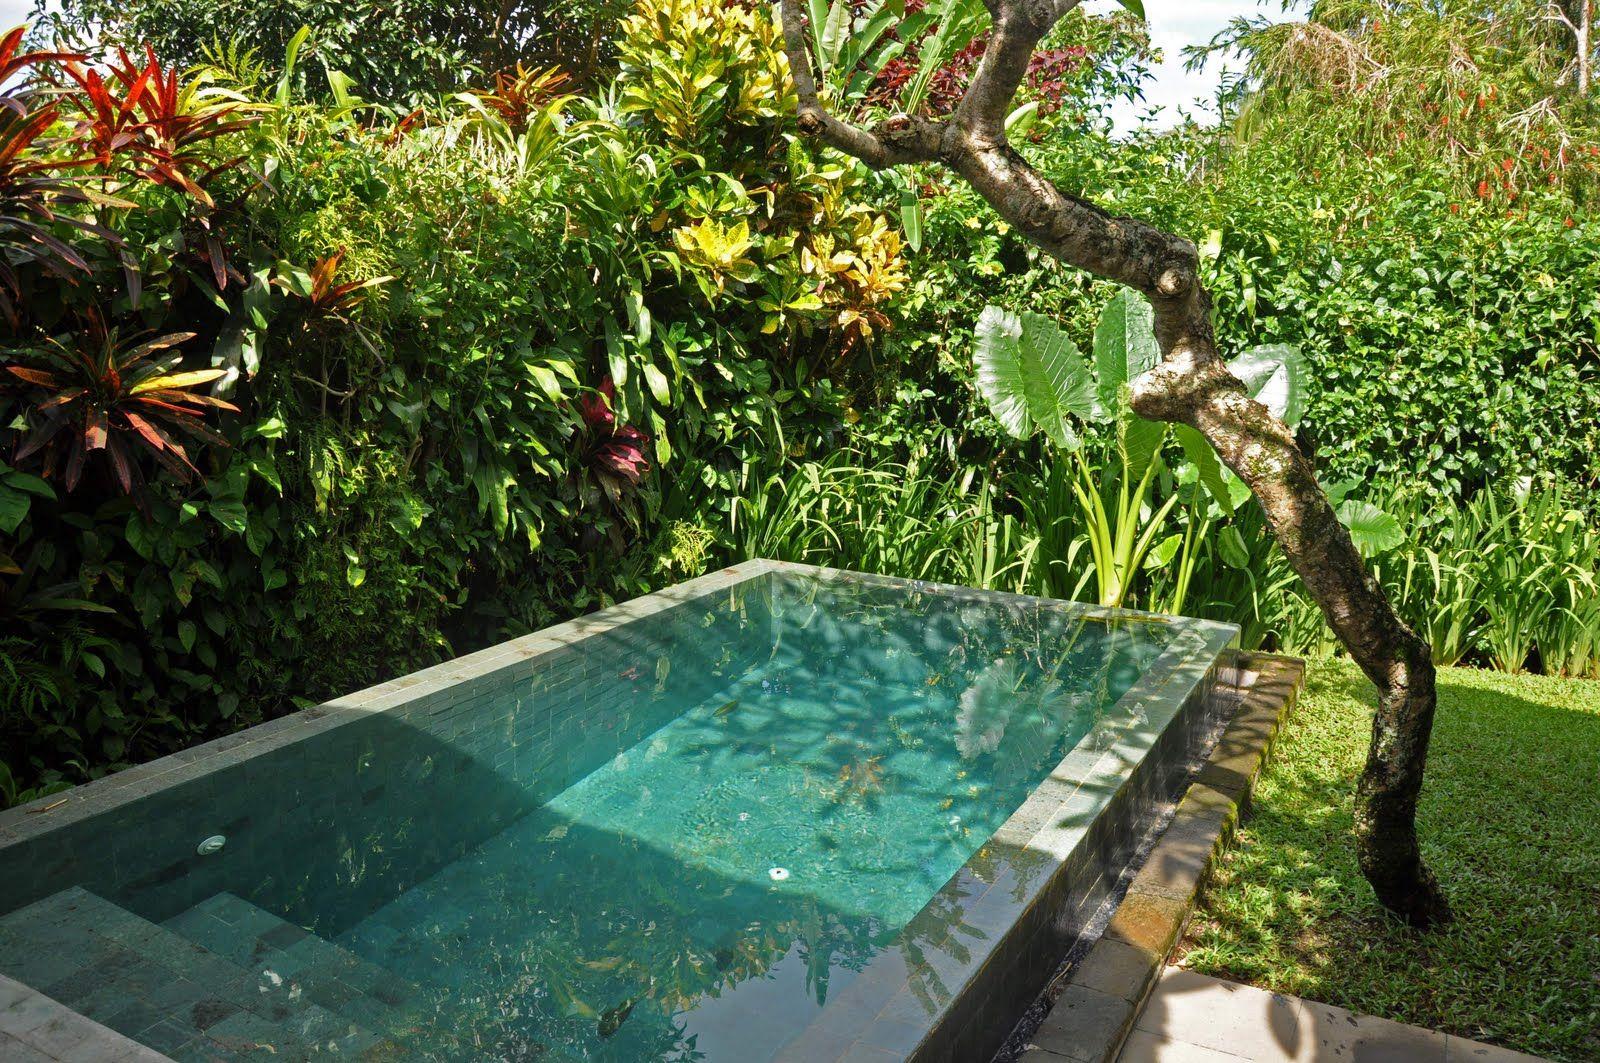 Small Garden Plunge Pool Google Search Backyard Porch Tropical Landscaping Garden Pool